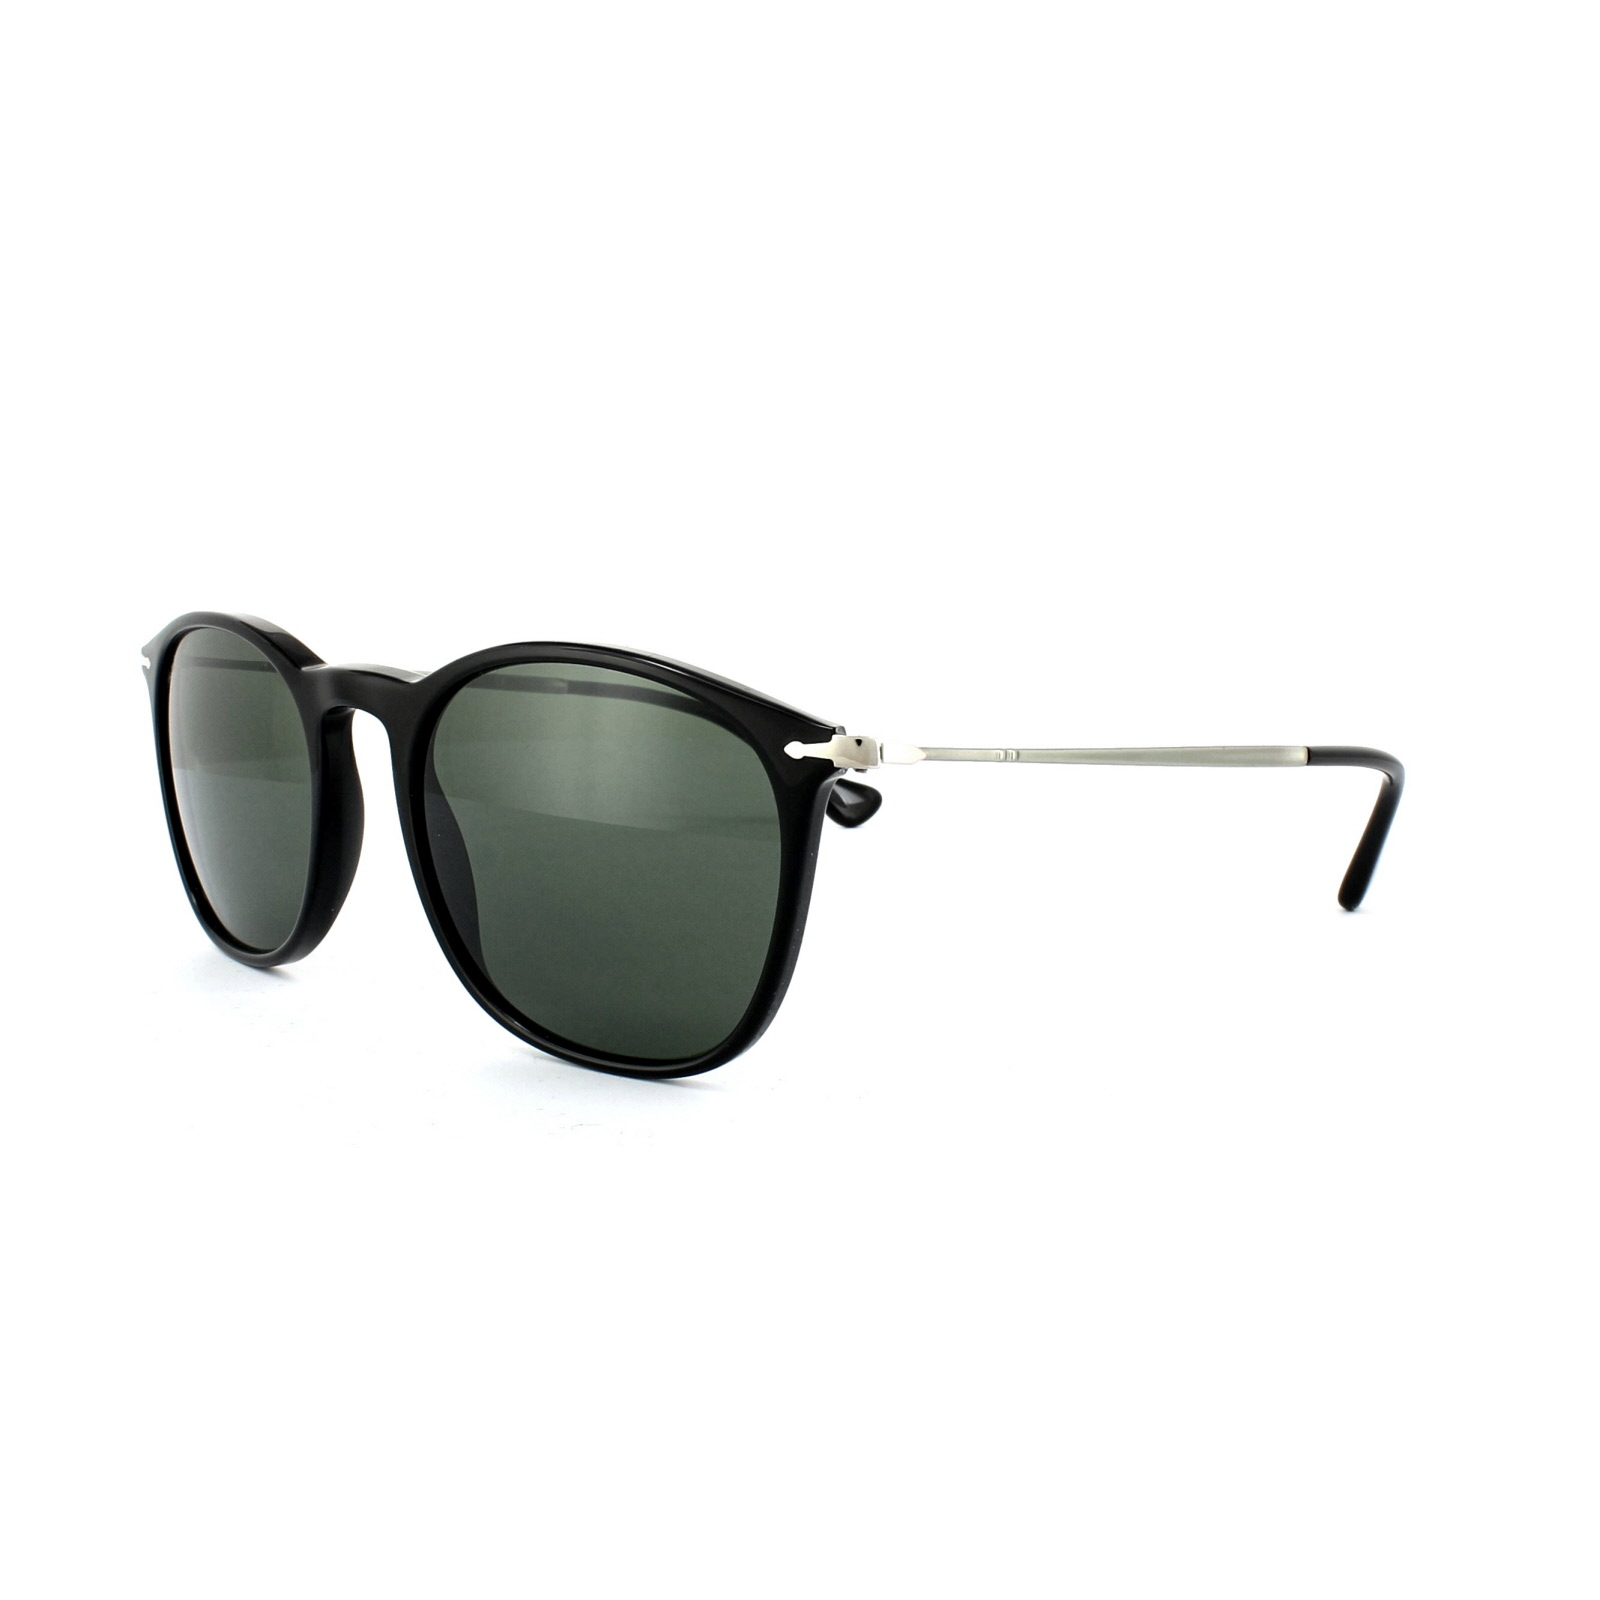 Persol Sunglasses 3124 95 31 Black Grey Green 8053672472554   eBay b05607376aa3